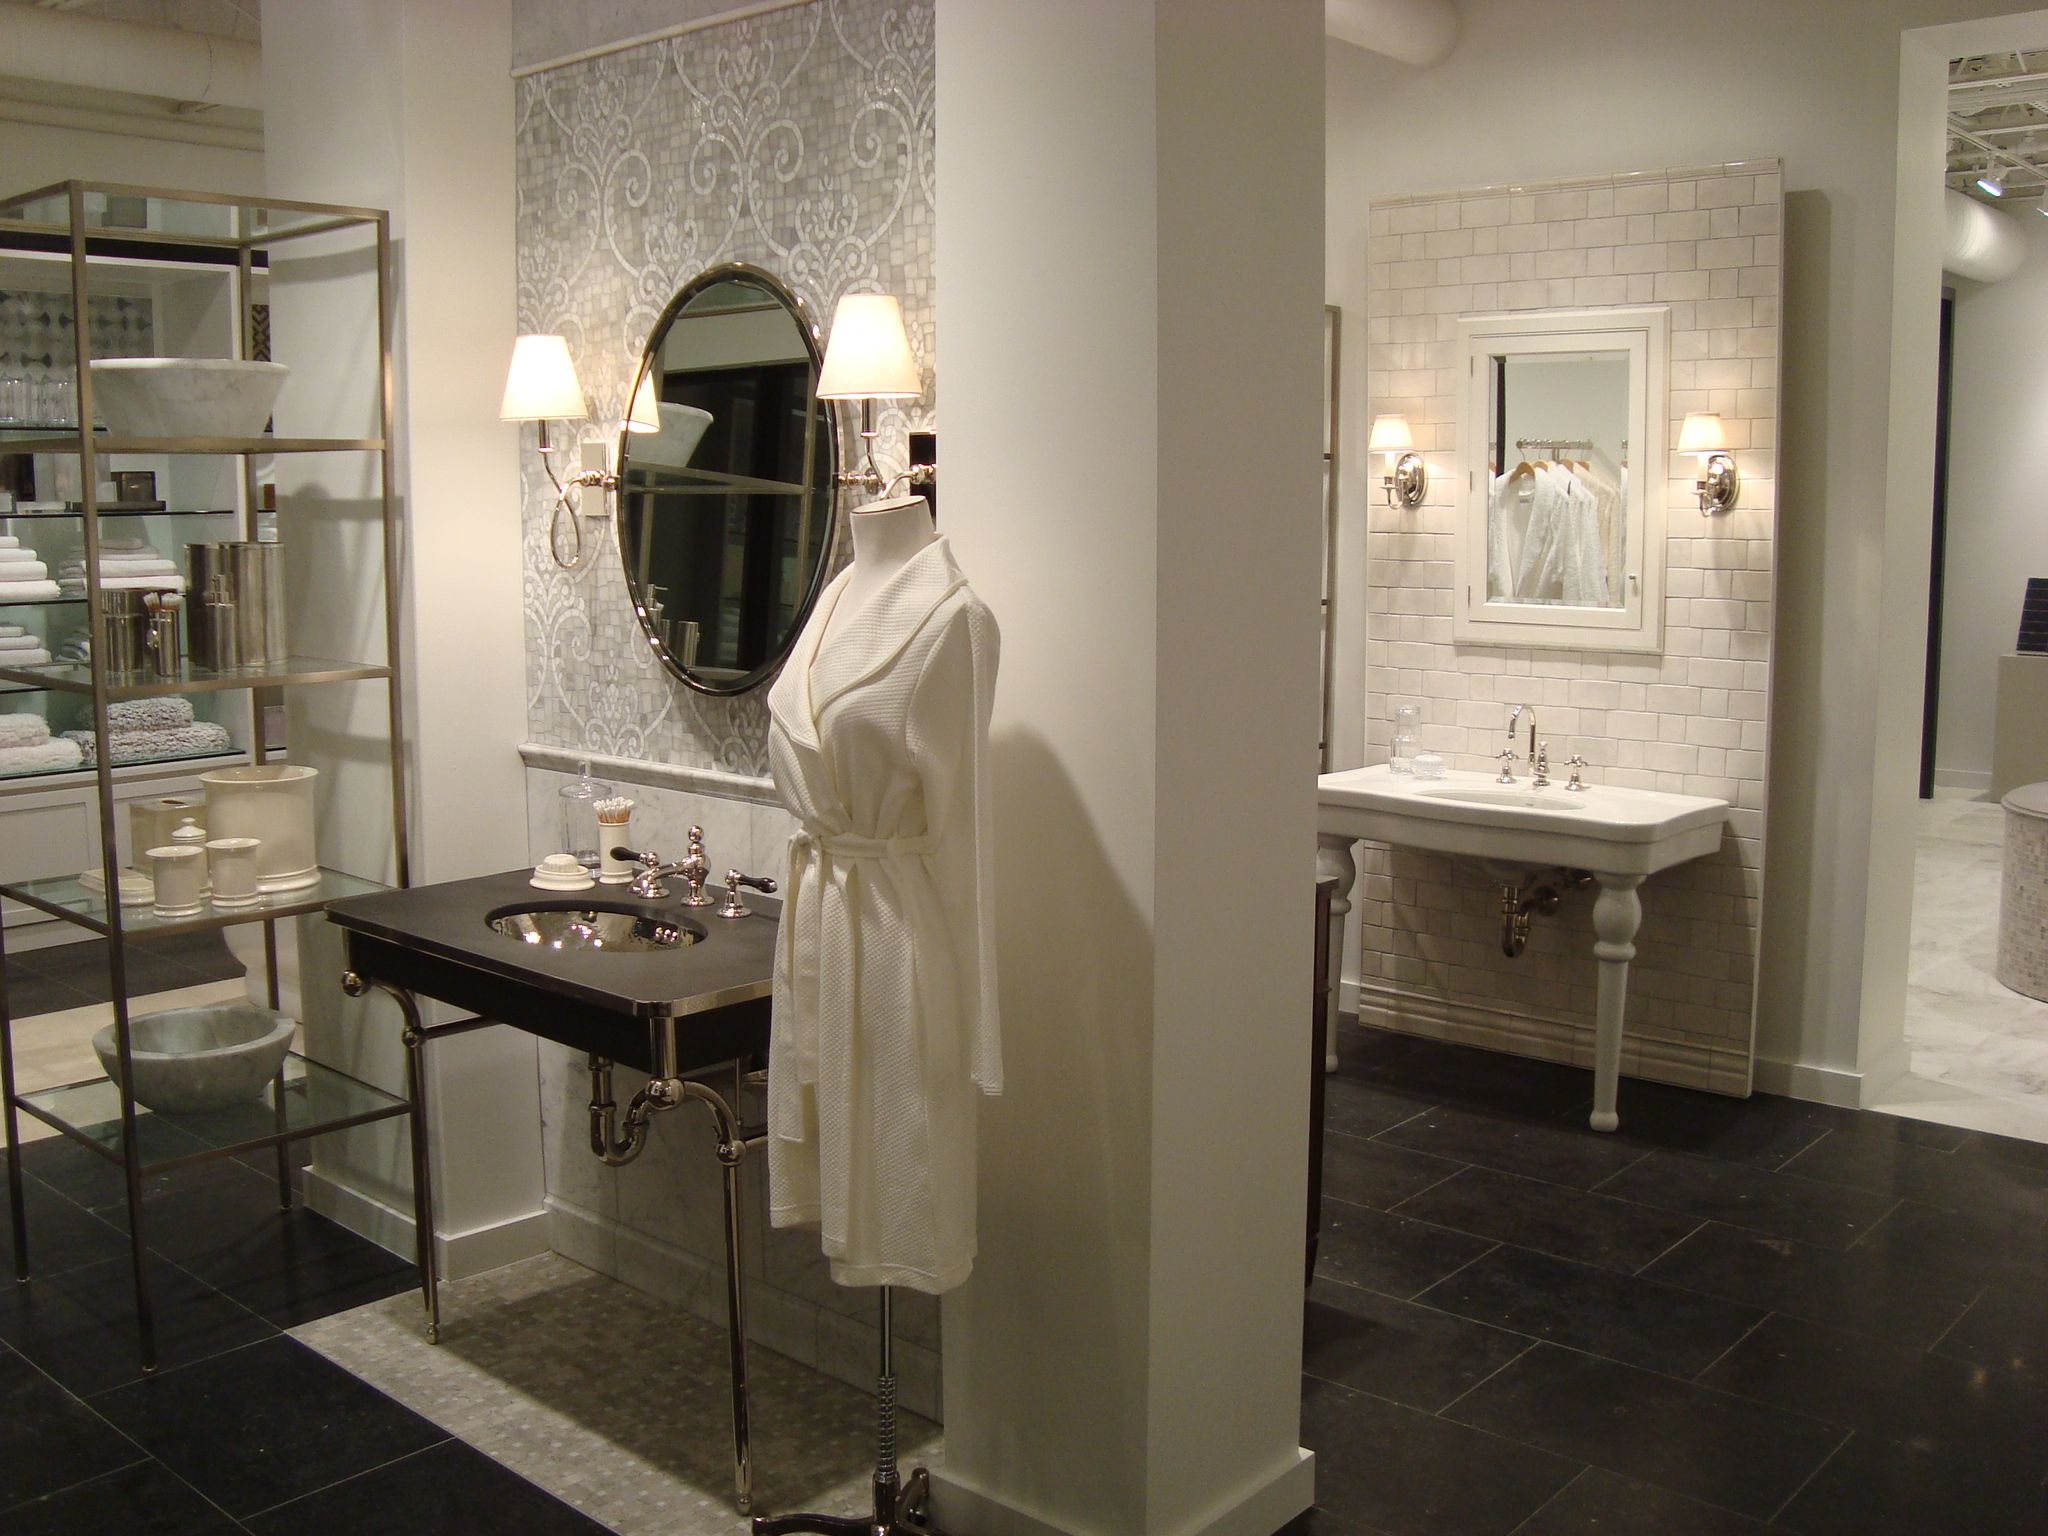 Waterworks Miami Showroom Display Miami Showroom Pinterest - Bathroom showrooms in miami